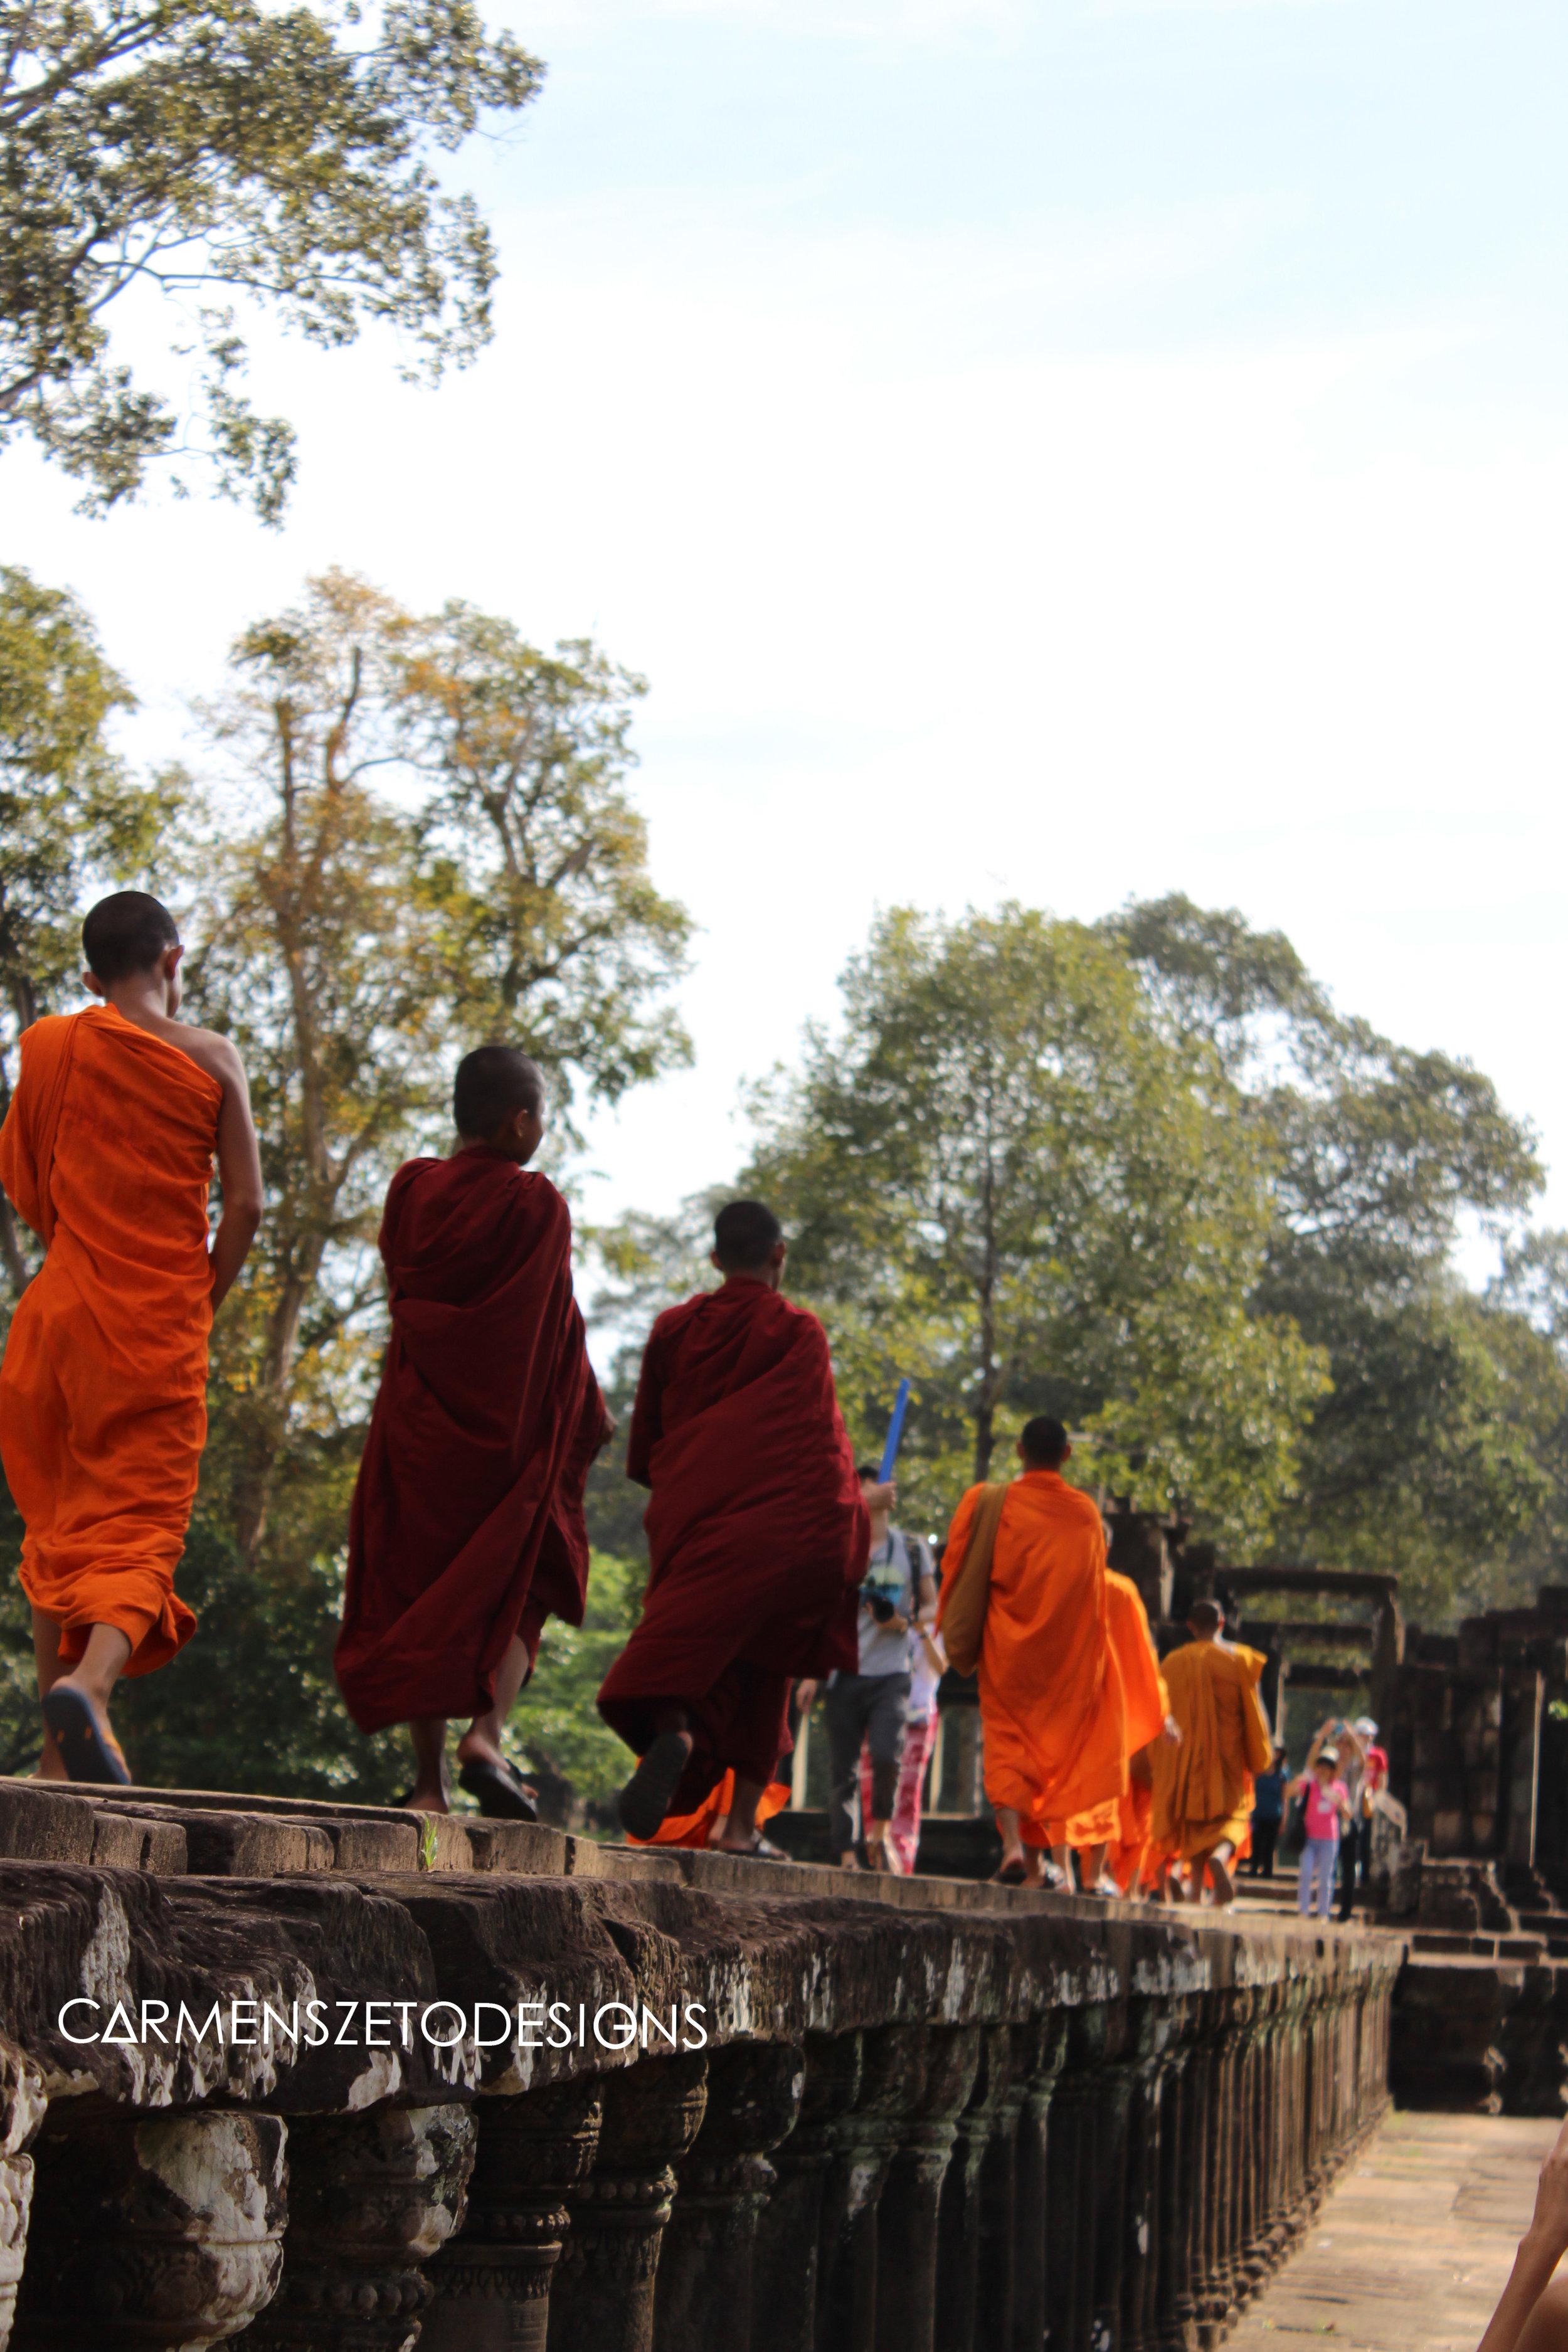 Monks in Angkor Thom, Cambodia